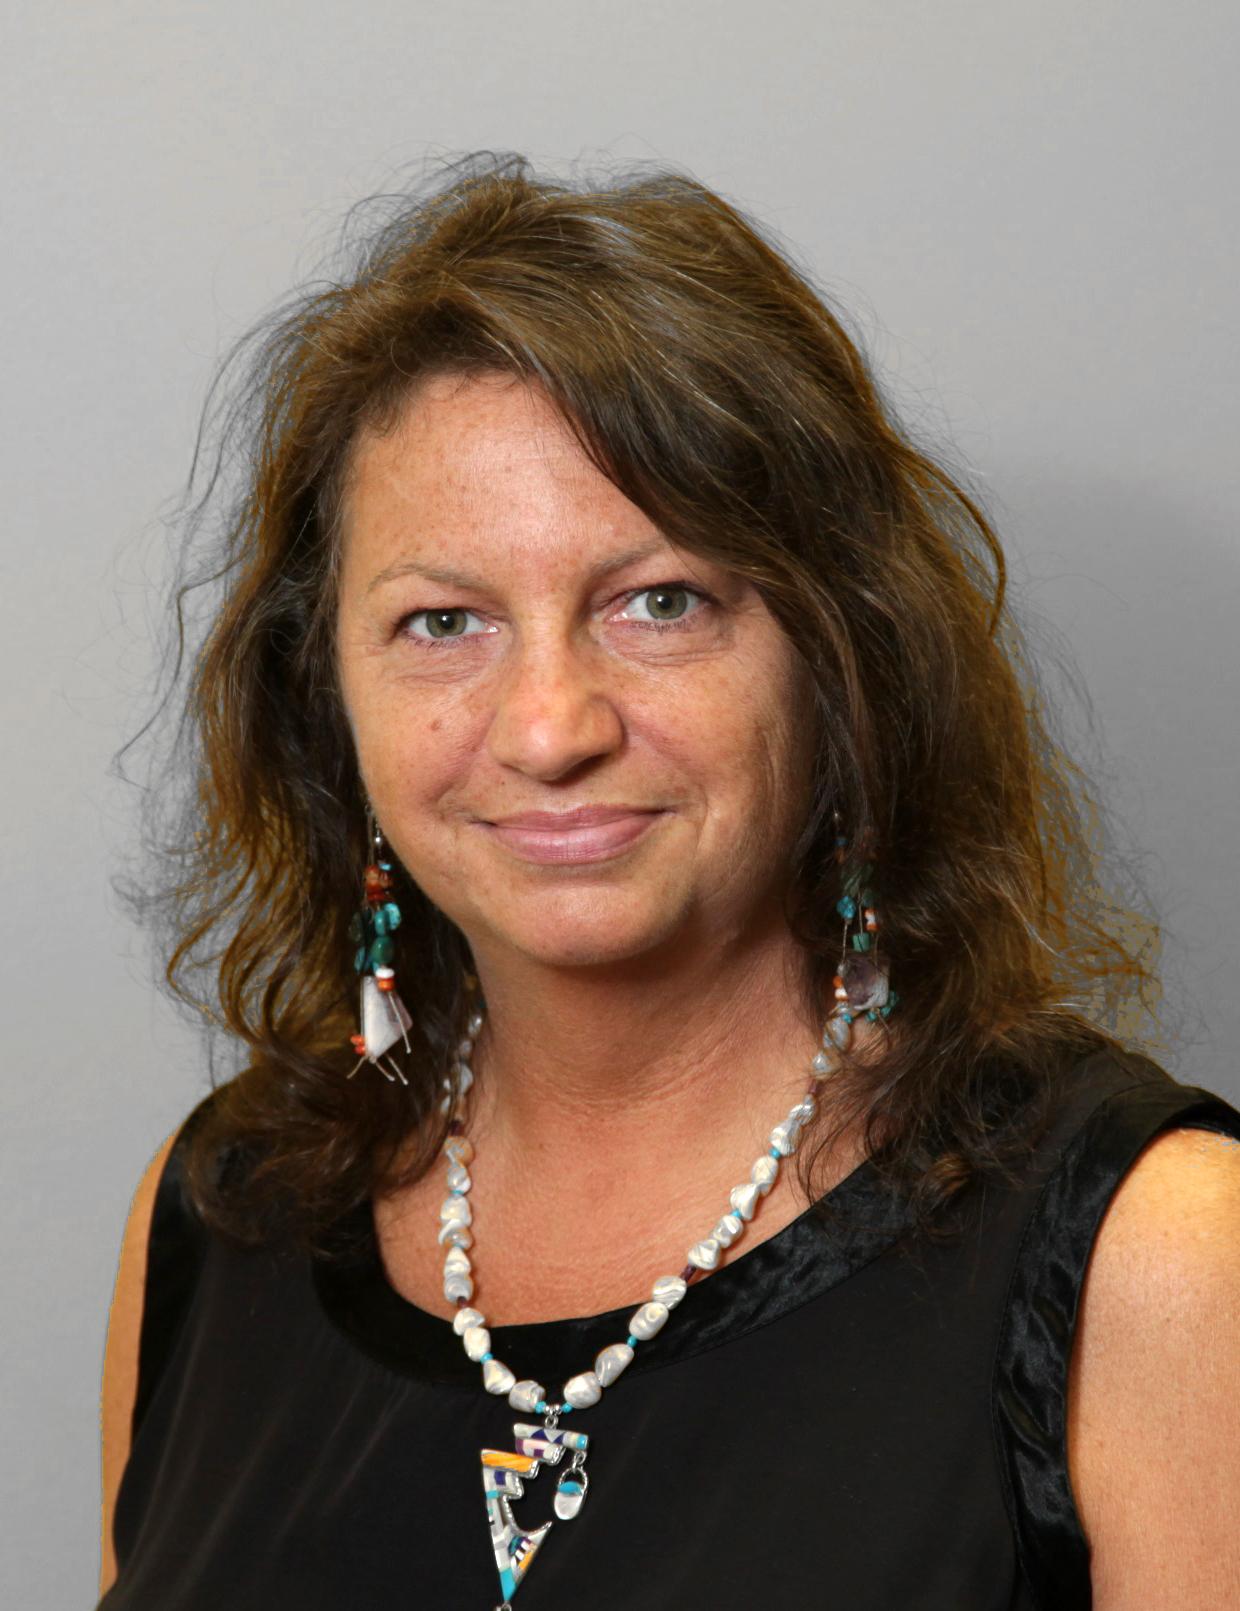 Denise Biron : Medical Records